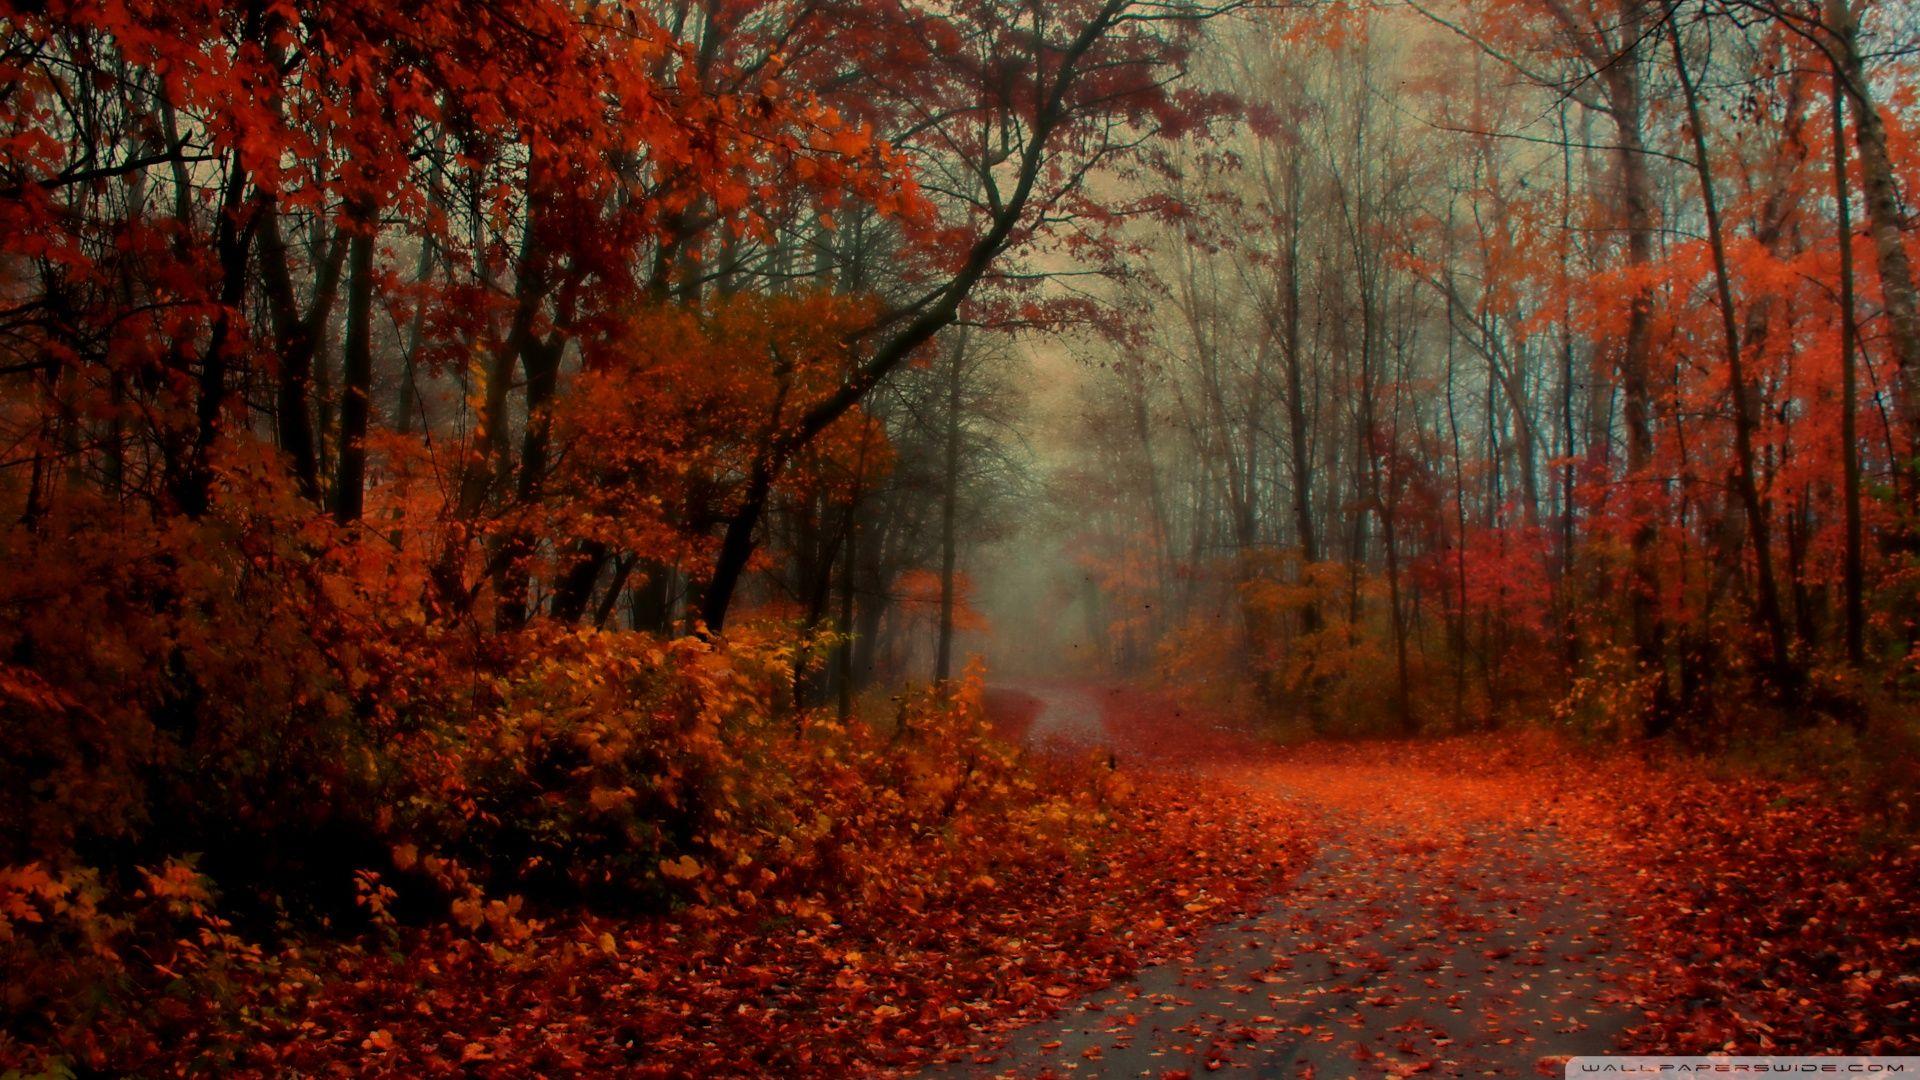 Romantic Autumn Widescreen Wallpaper HD Wallpaper at